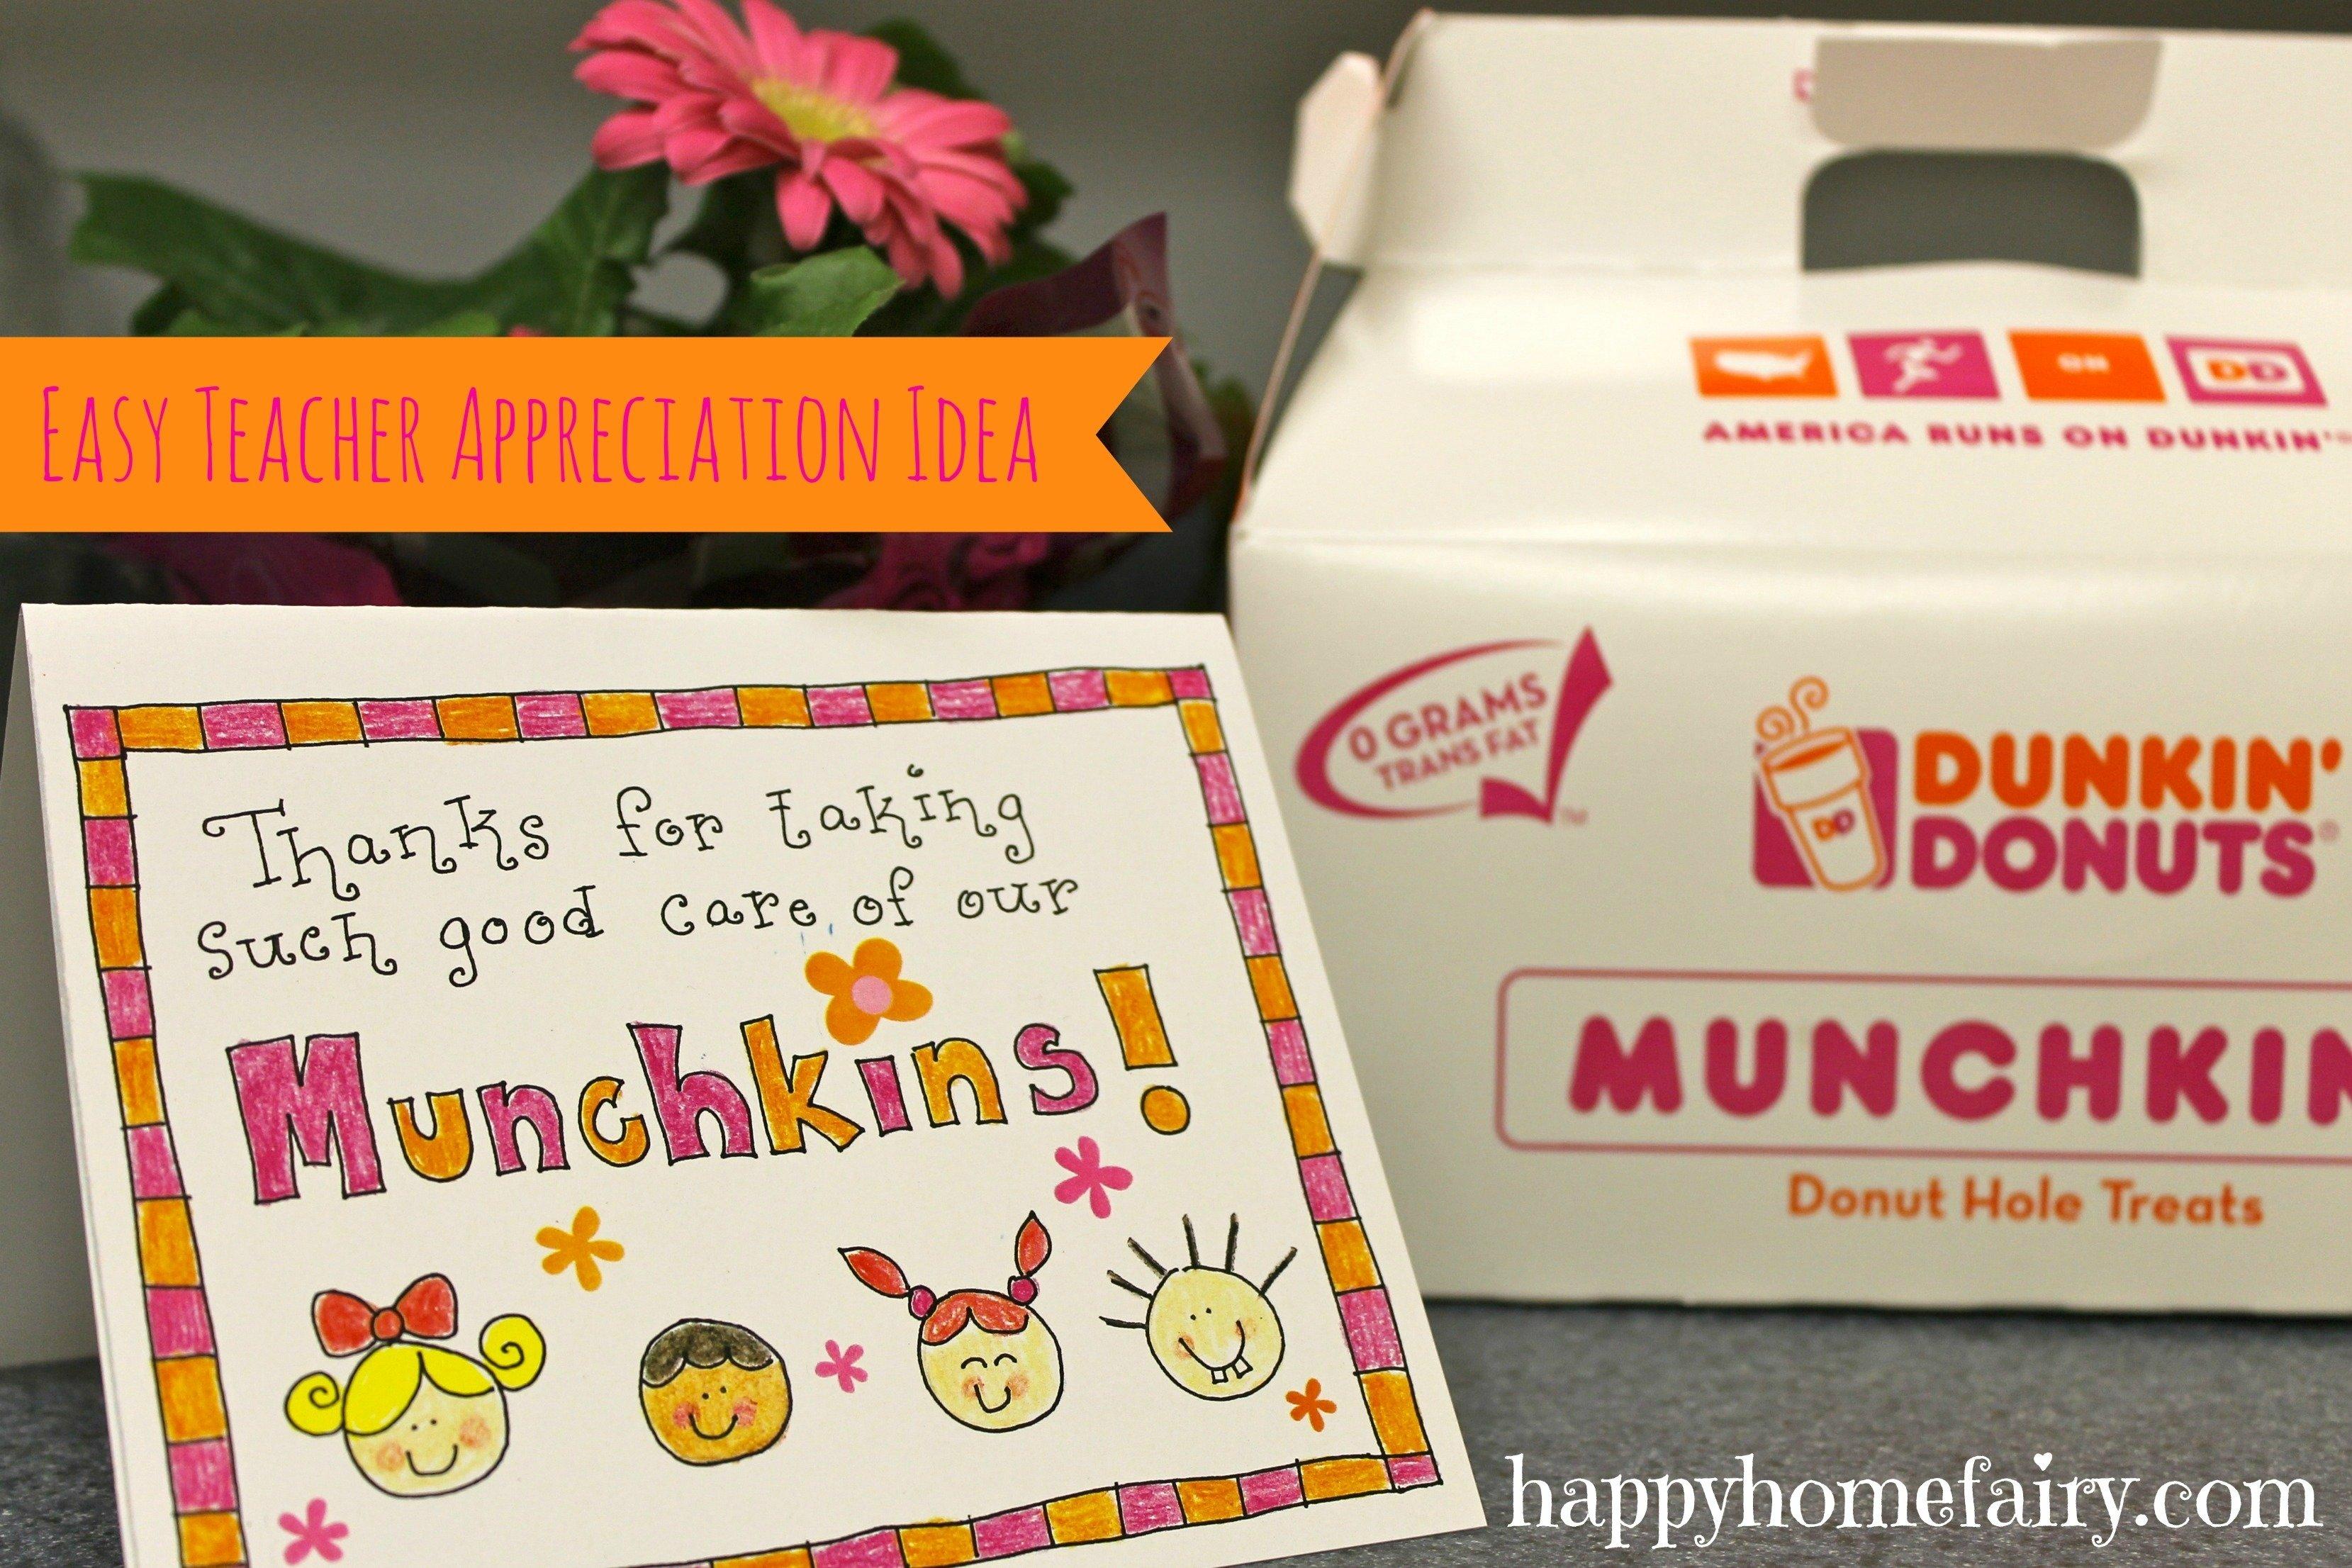 10 Famous Ideas For Teacher Appreciation Week easy teacher appreciation idea free printable happy home fairy 1 2020